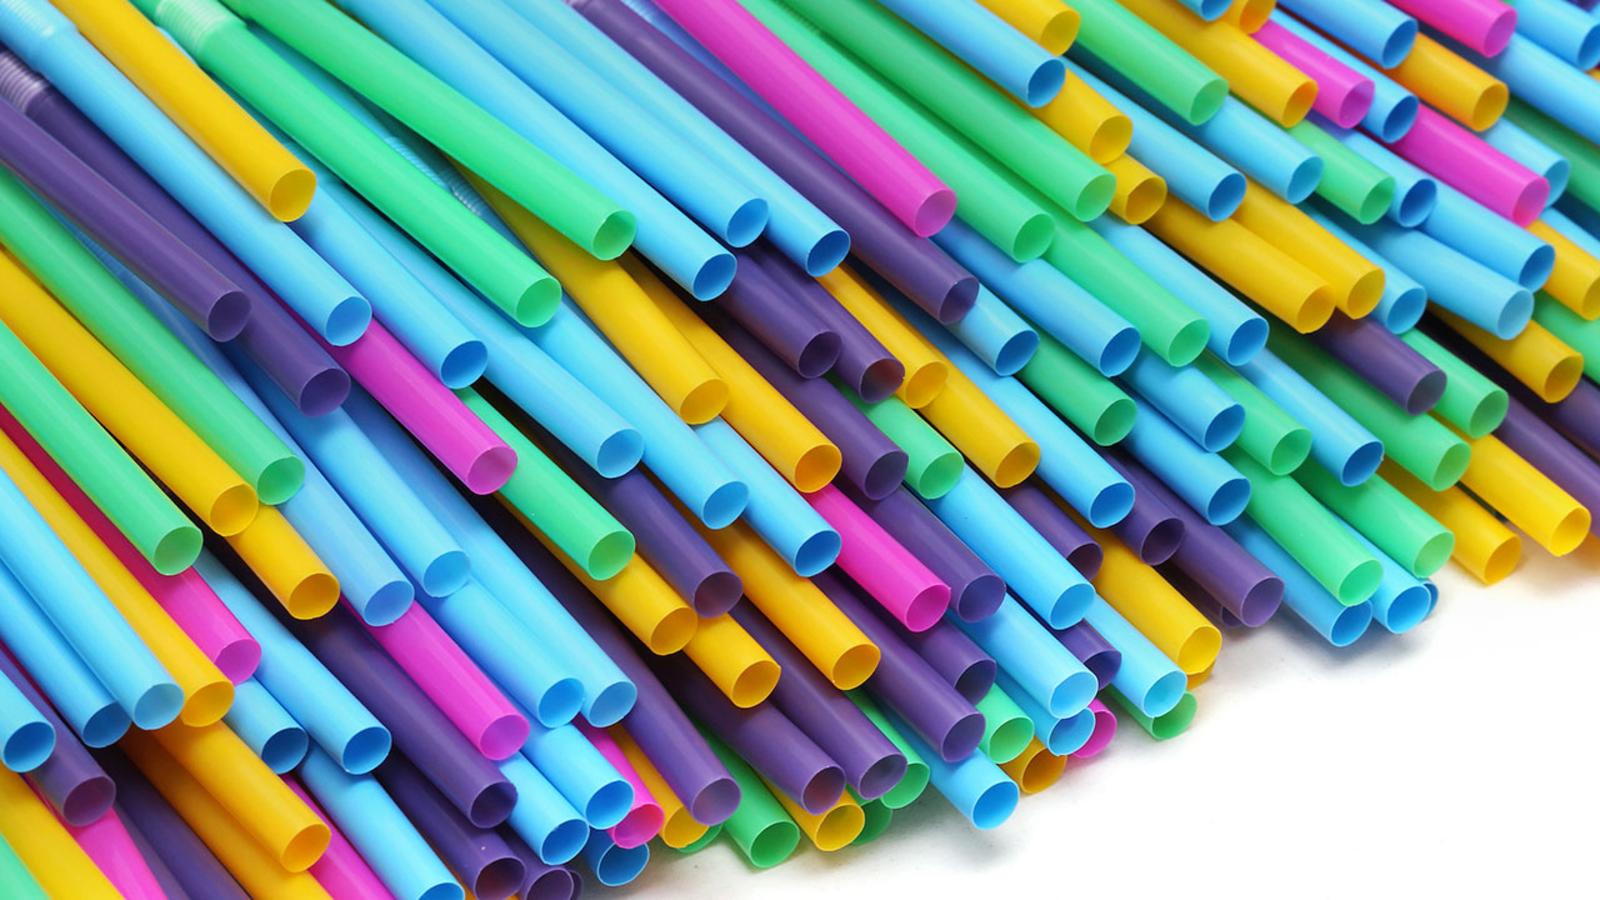 Bon Appetit Bans Plastic Straws  Stirrers At More Than